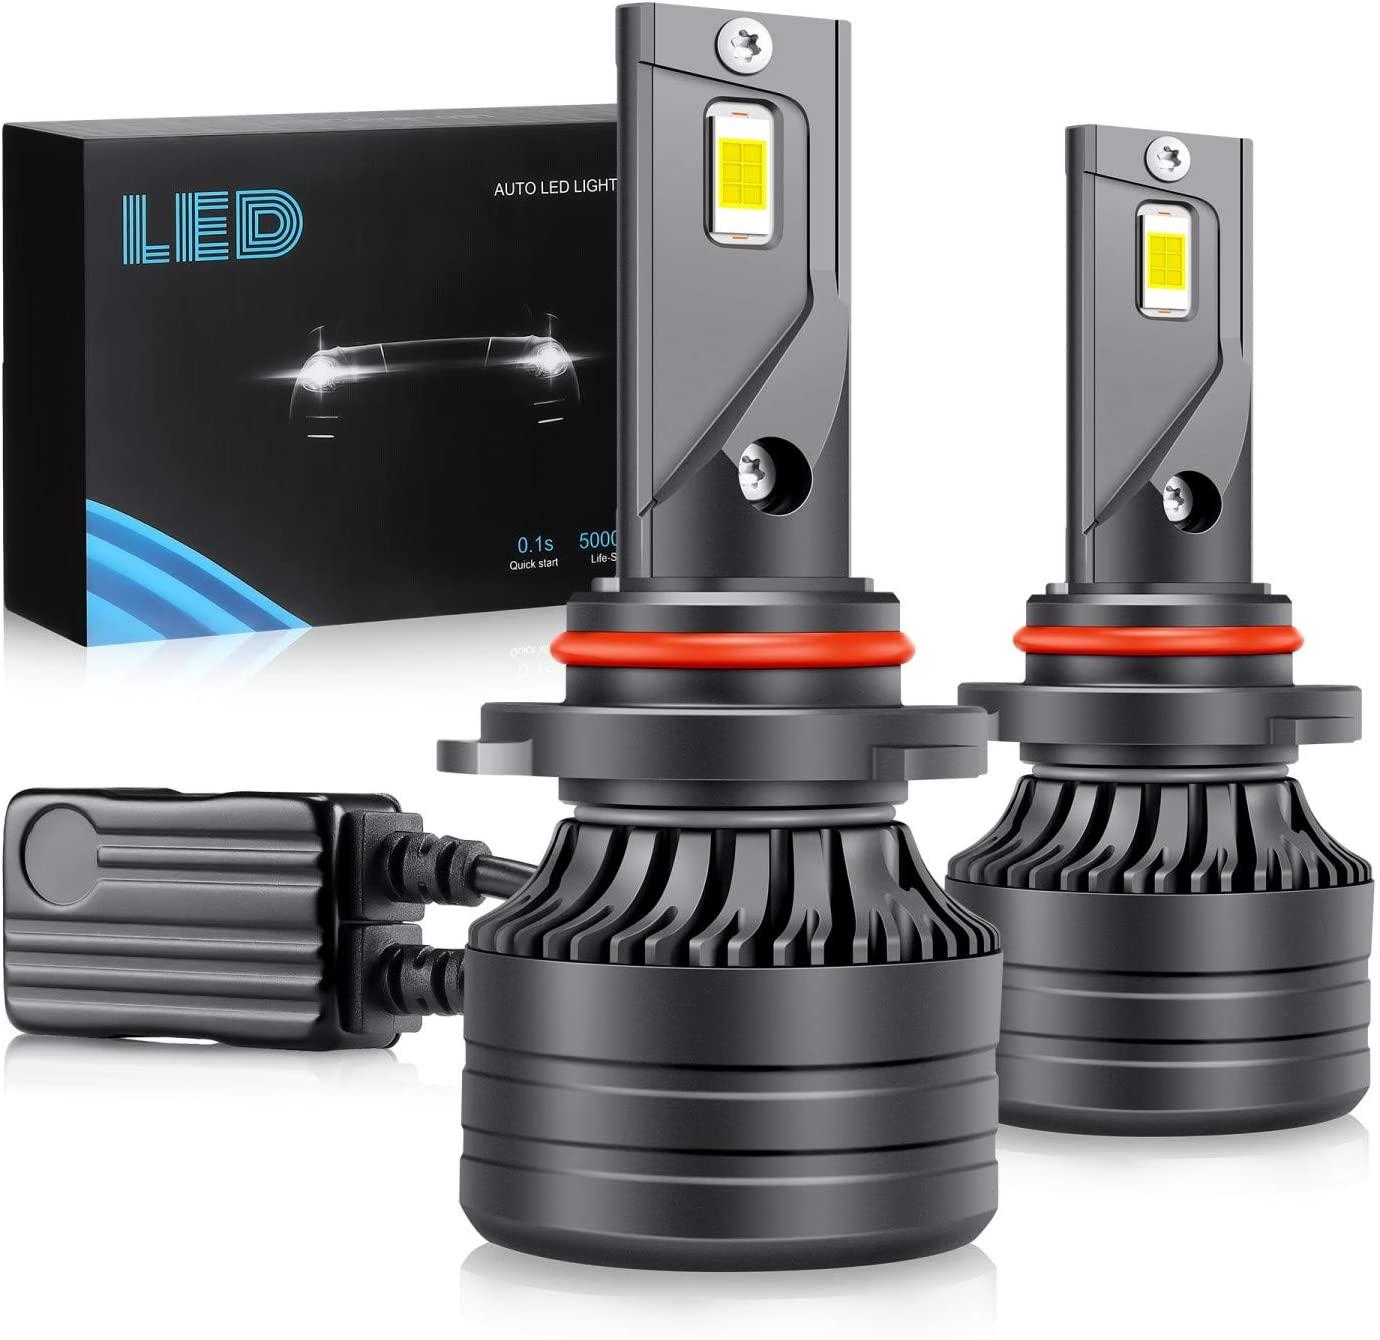 9005 HB3 LED Headlight Bulbs,60W 10000Lumens Super Bright LED Headlights Conversion Kit 6000K Cool White IP68 Waterproof Pair